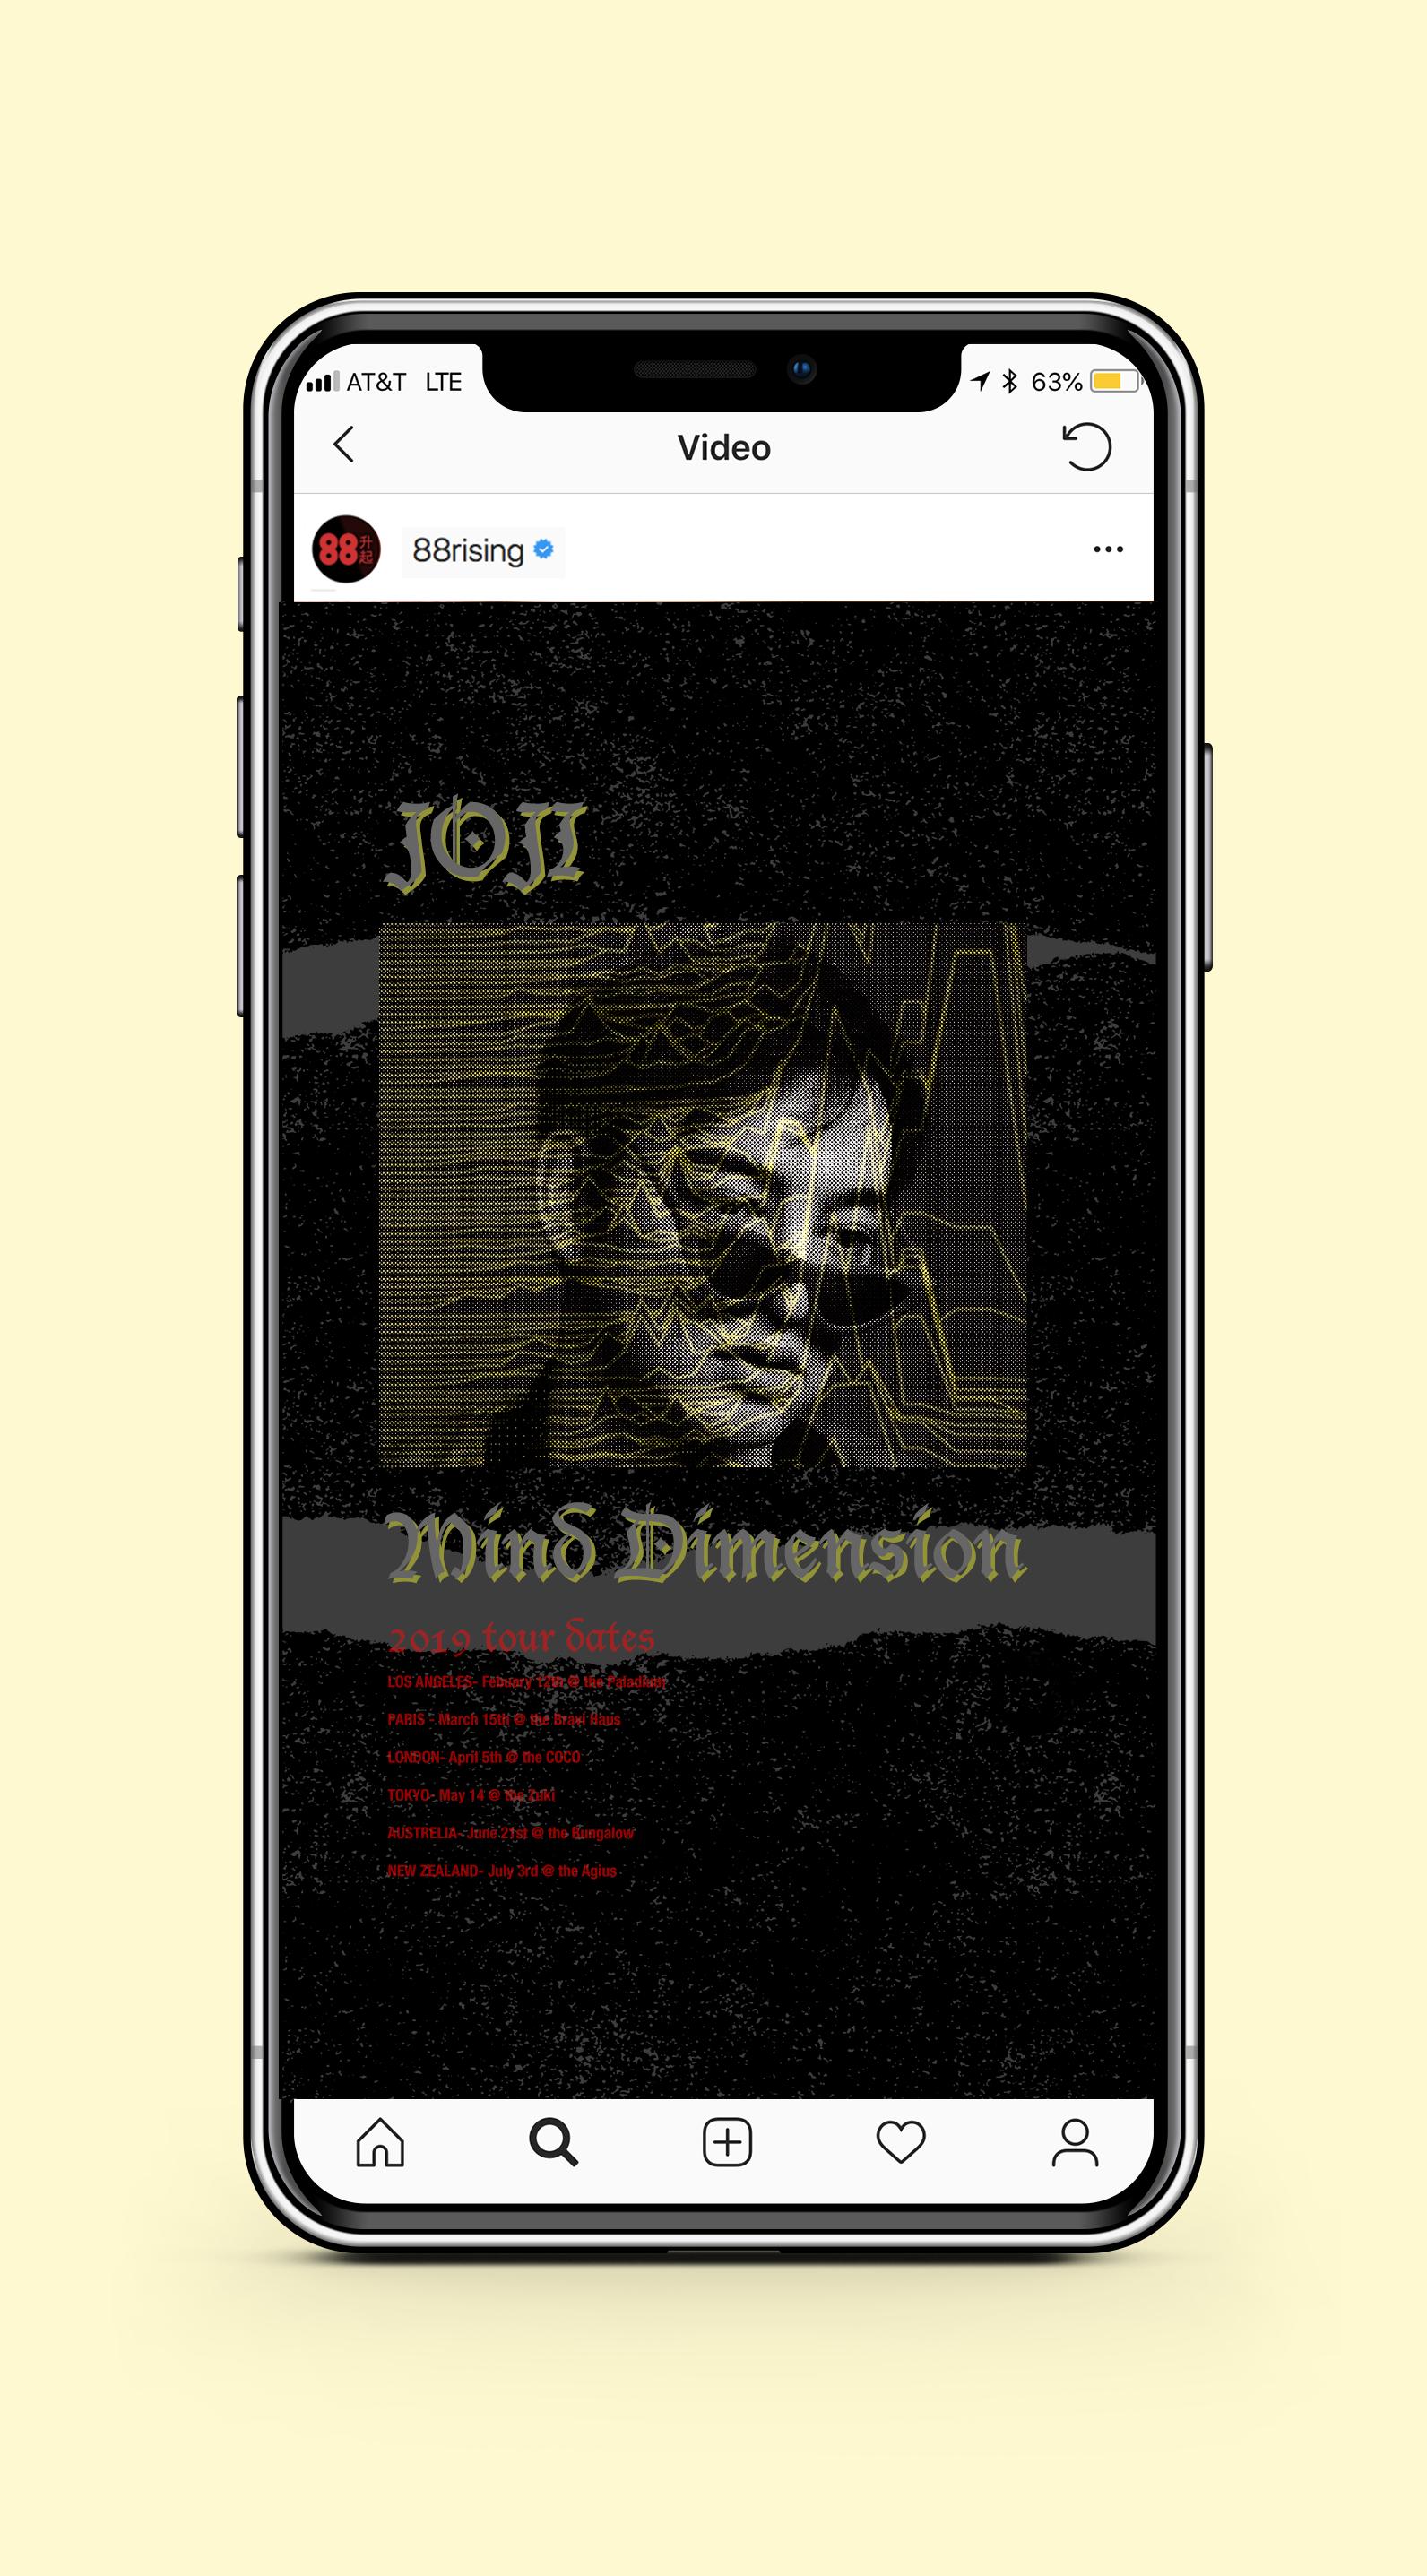 Joji_iphone.png